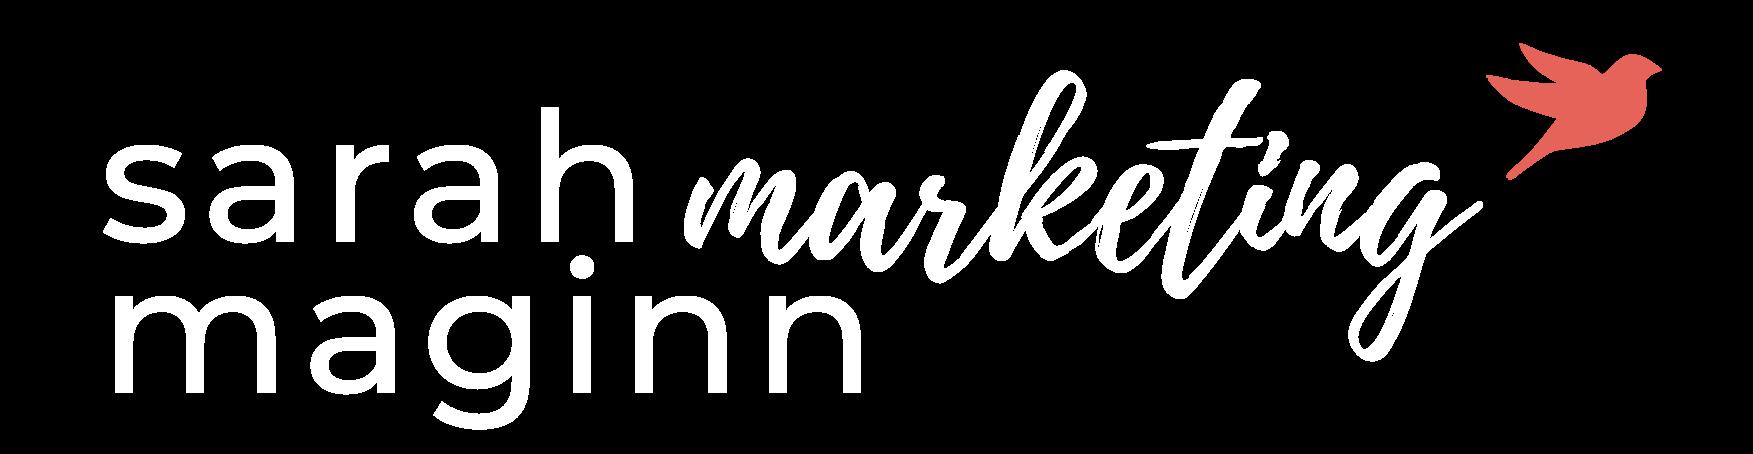 Sarah Maginn Marketing Norwich